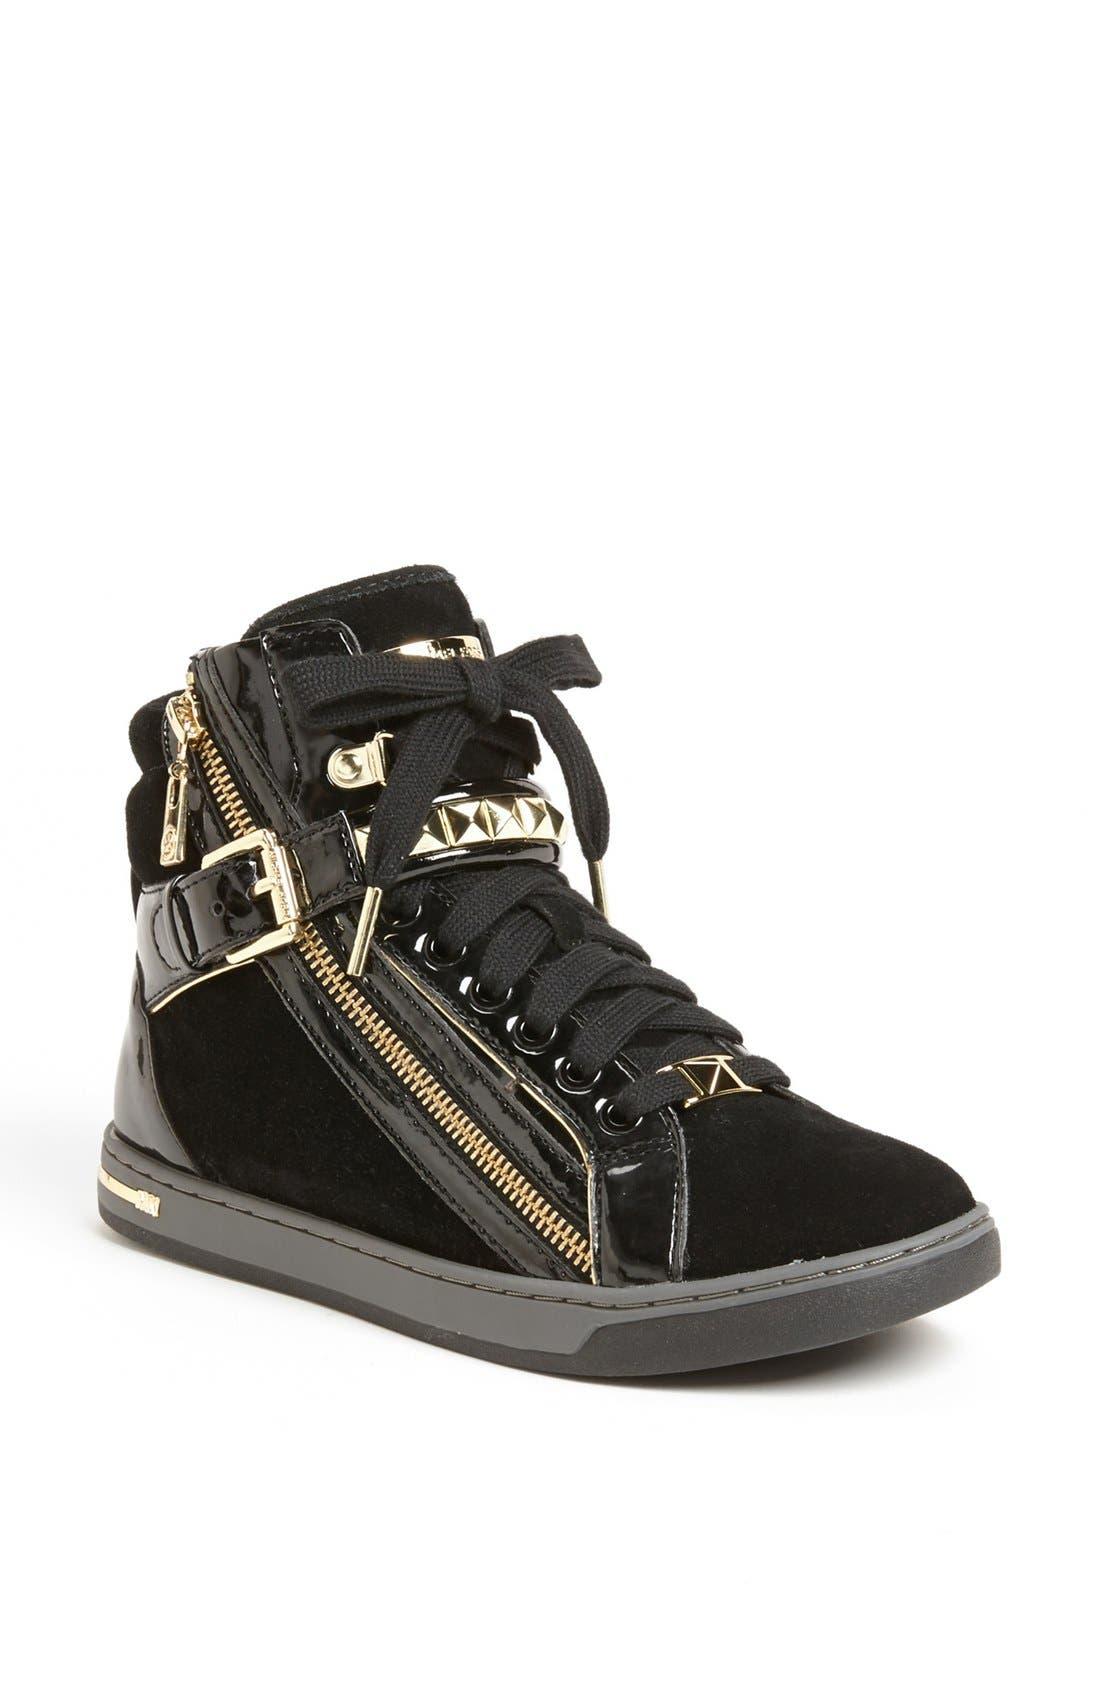 Main Image - MICHAEL Michael Kors 'Glam' Studded High Top Sneaker